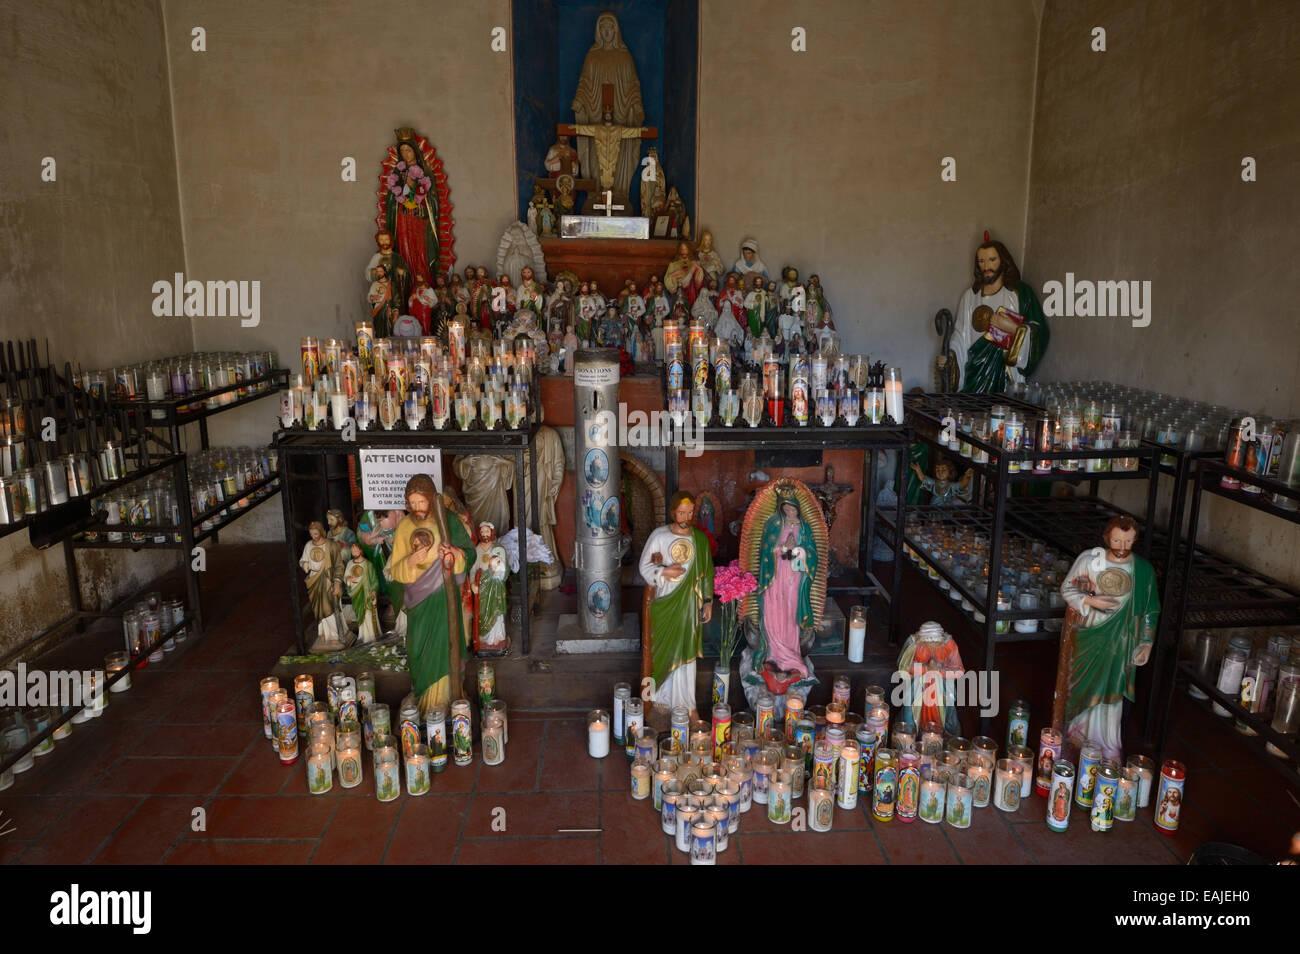 Mission San Xavier del Bac, Tucson AZ - Stock Image